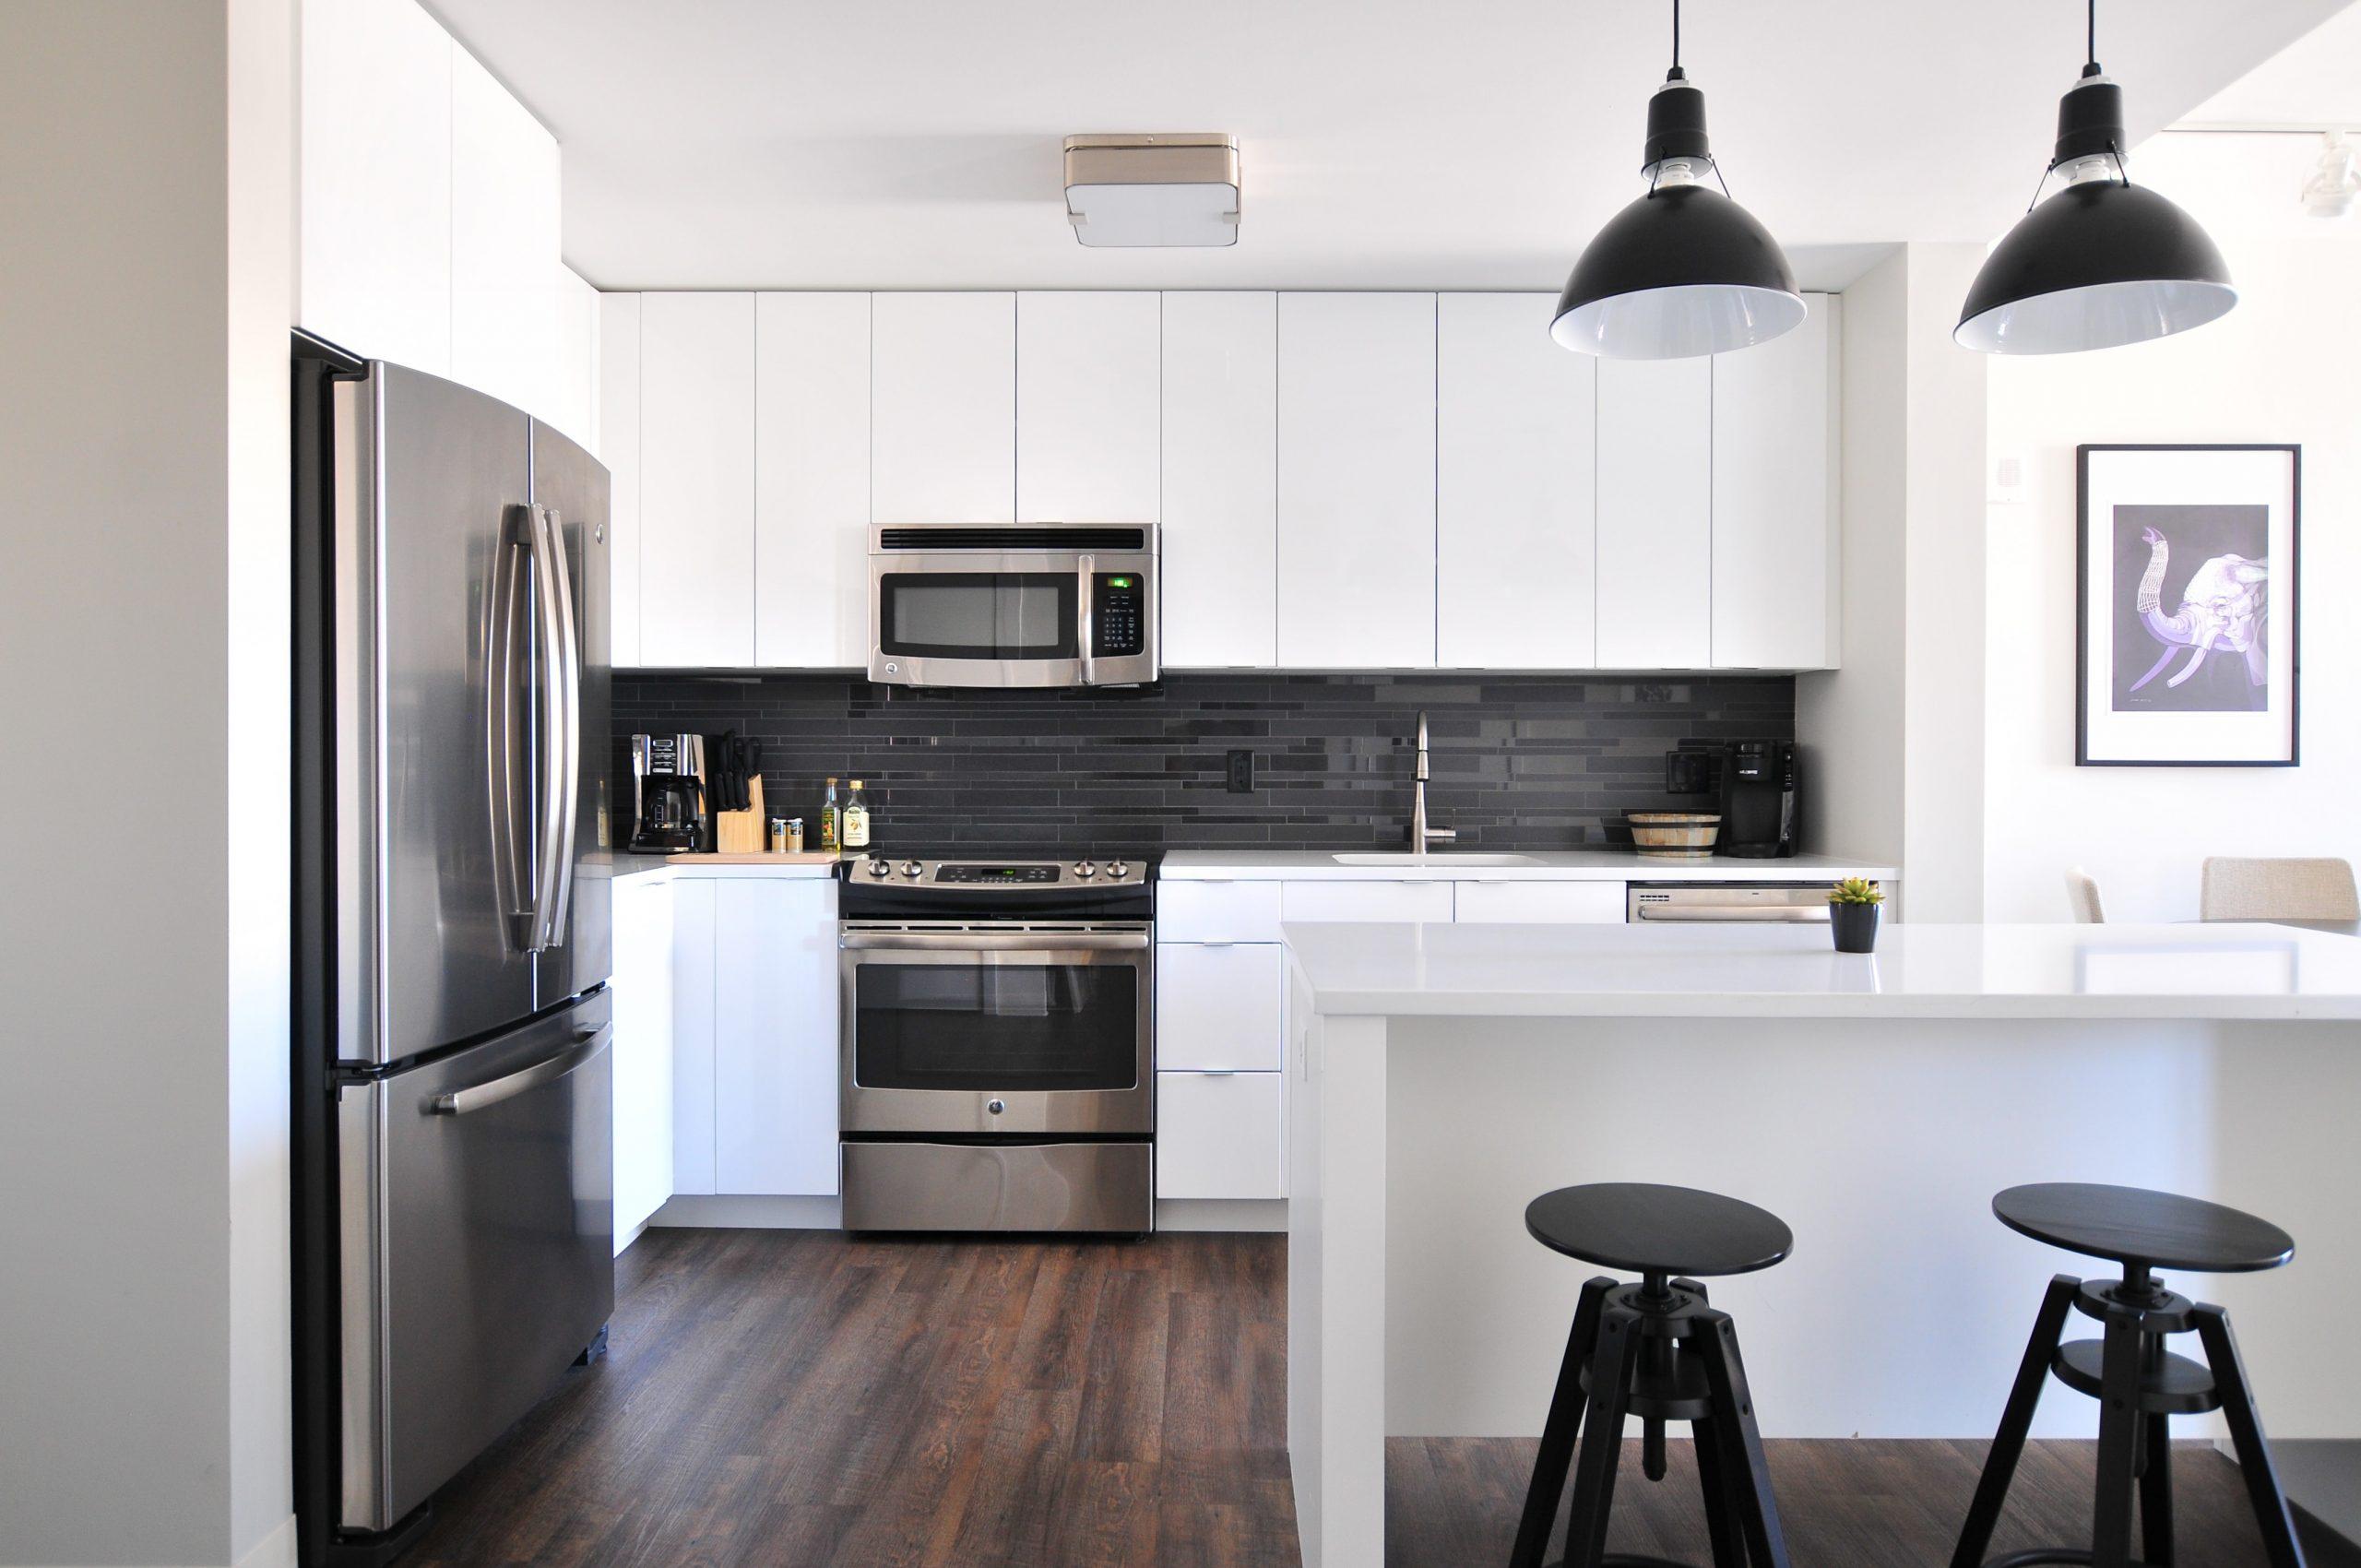 silver fridge in a kitchen